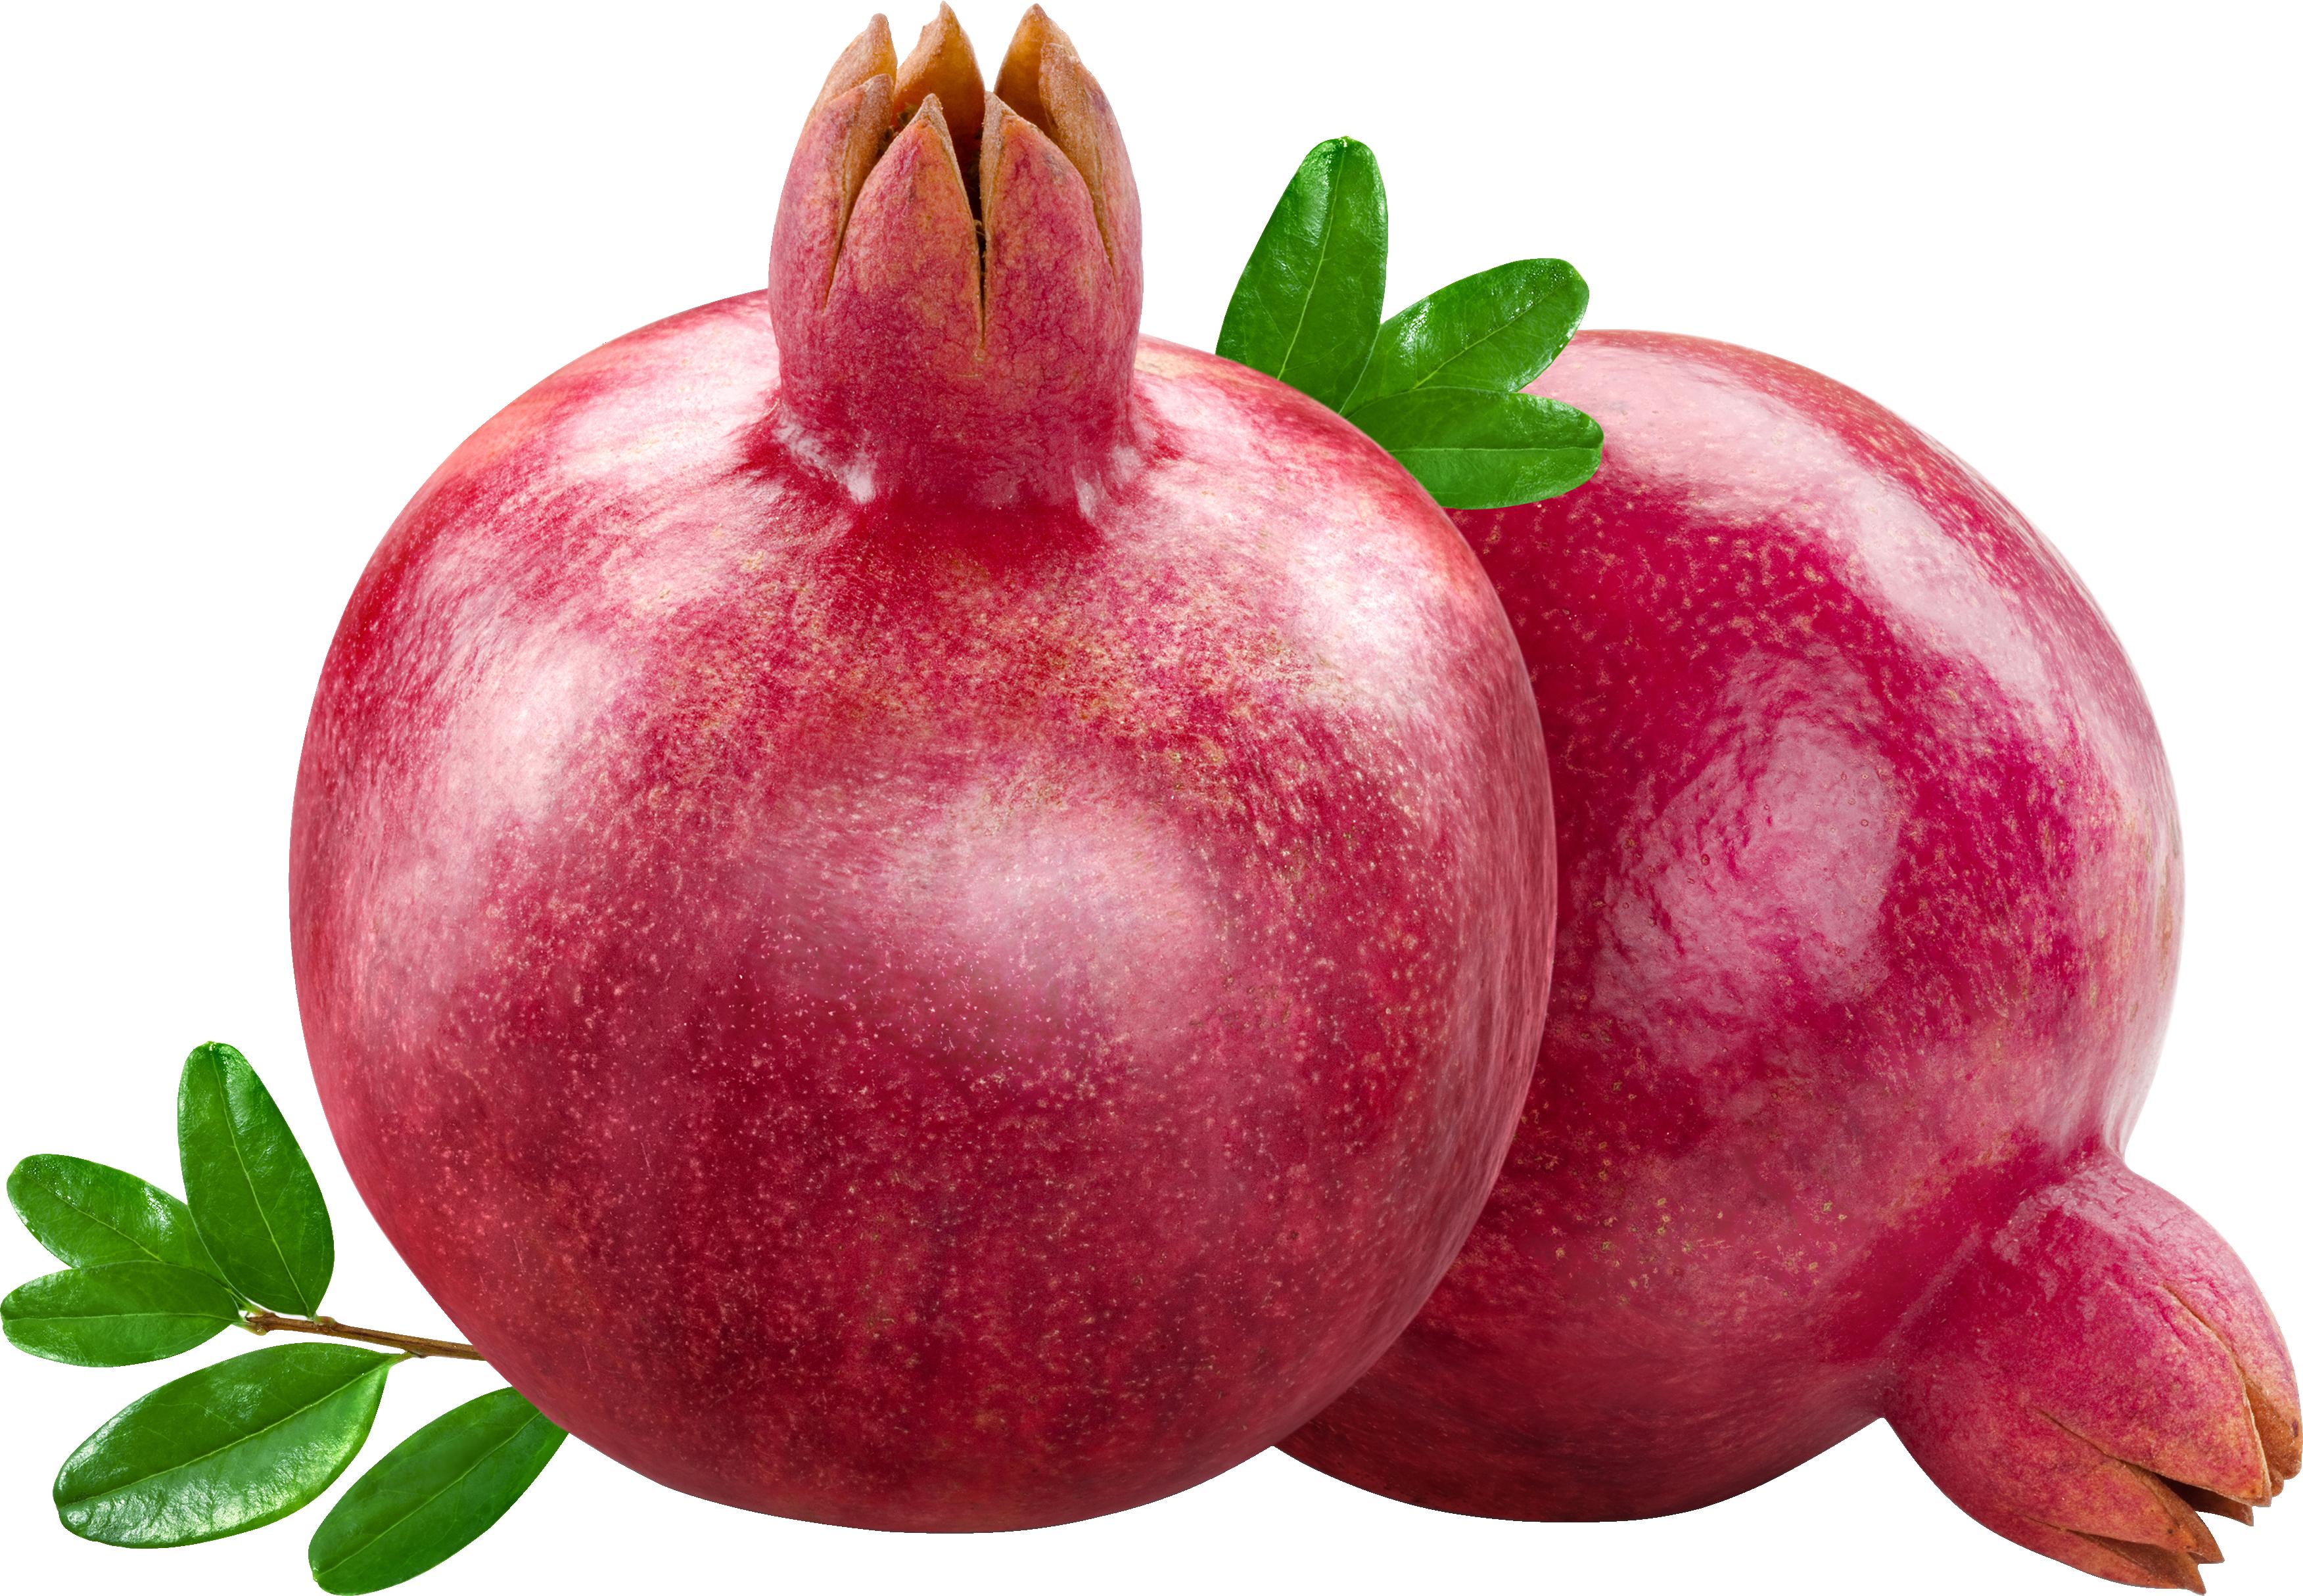 Pomegranate clipart anaar. Hq png transparent images